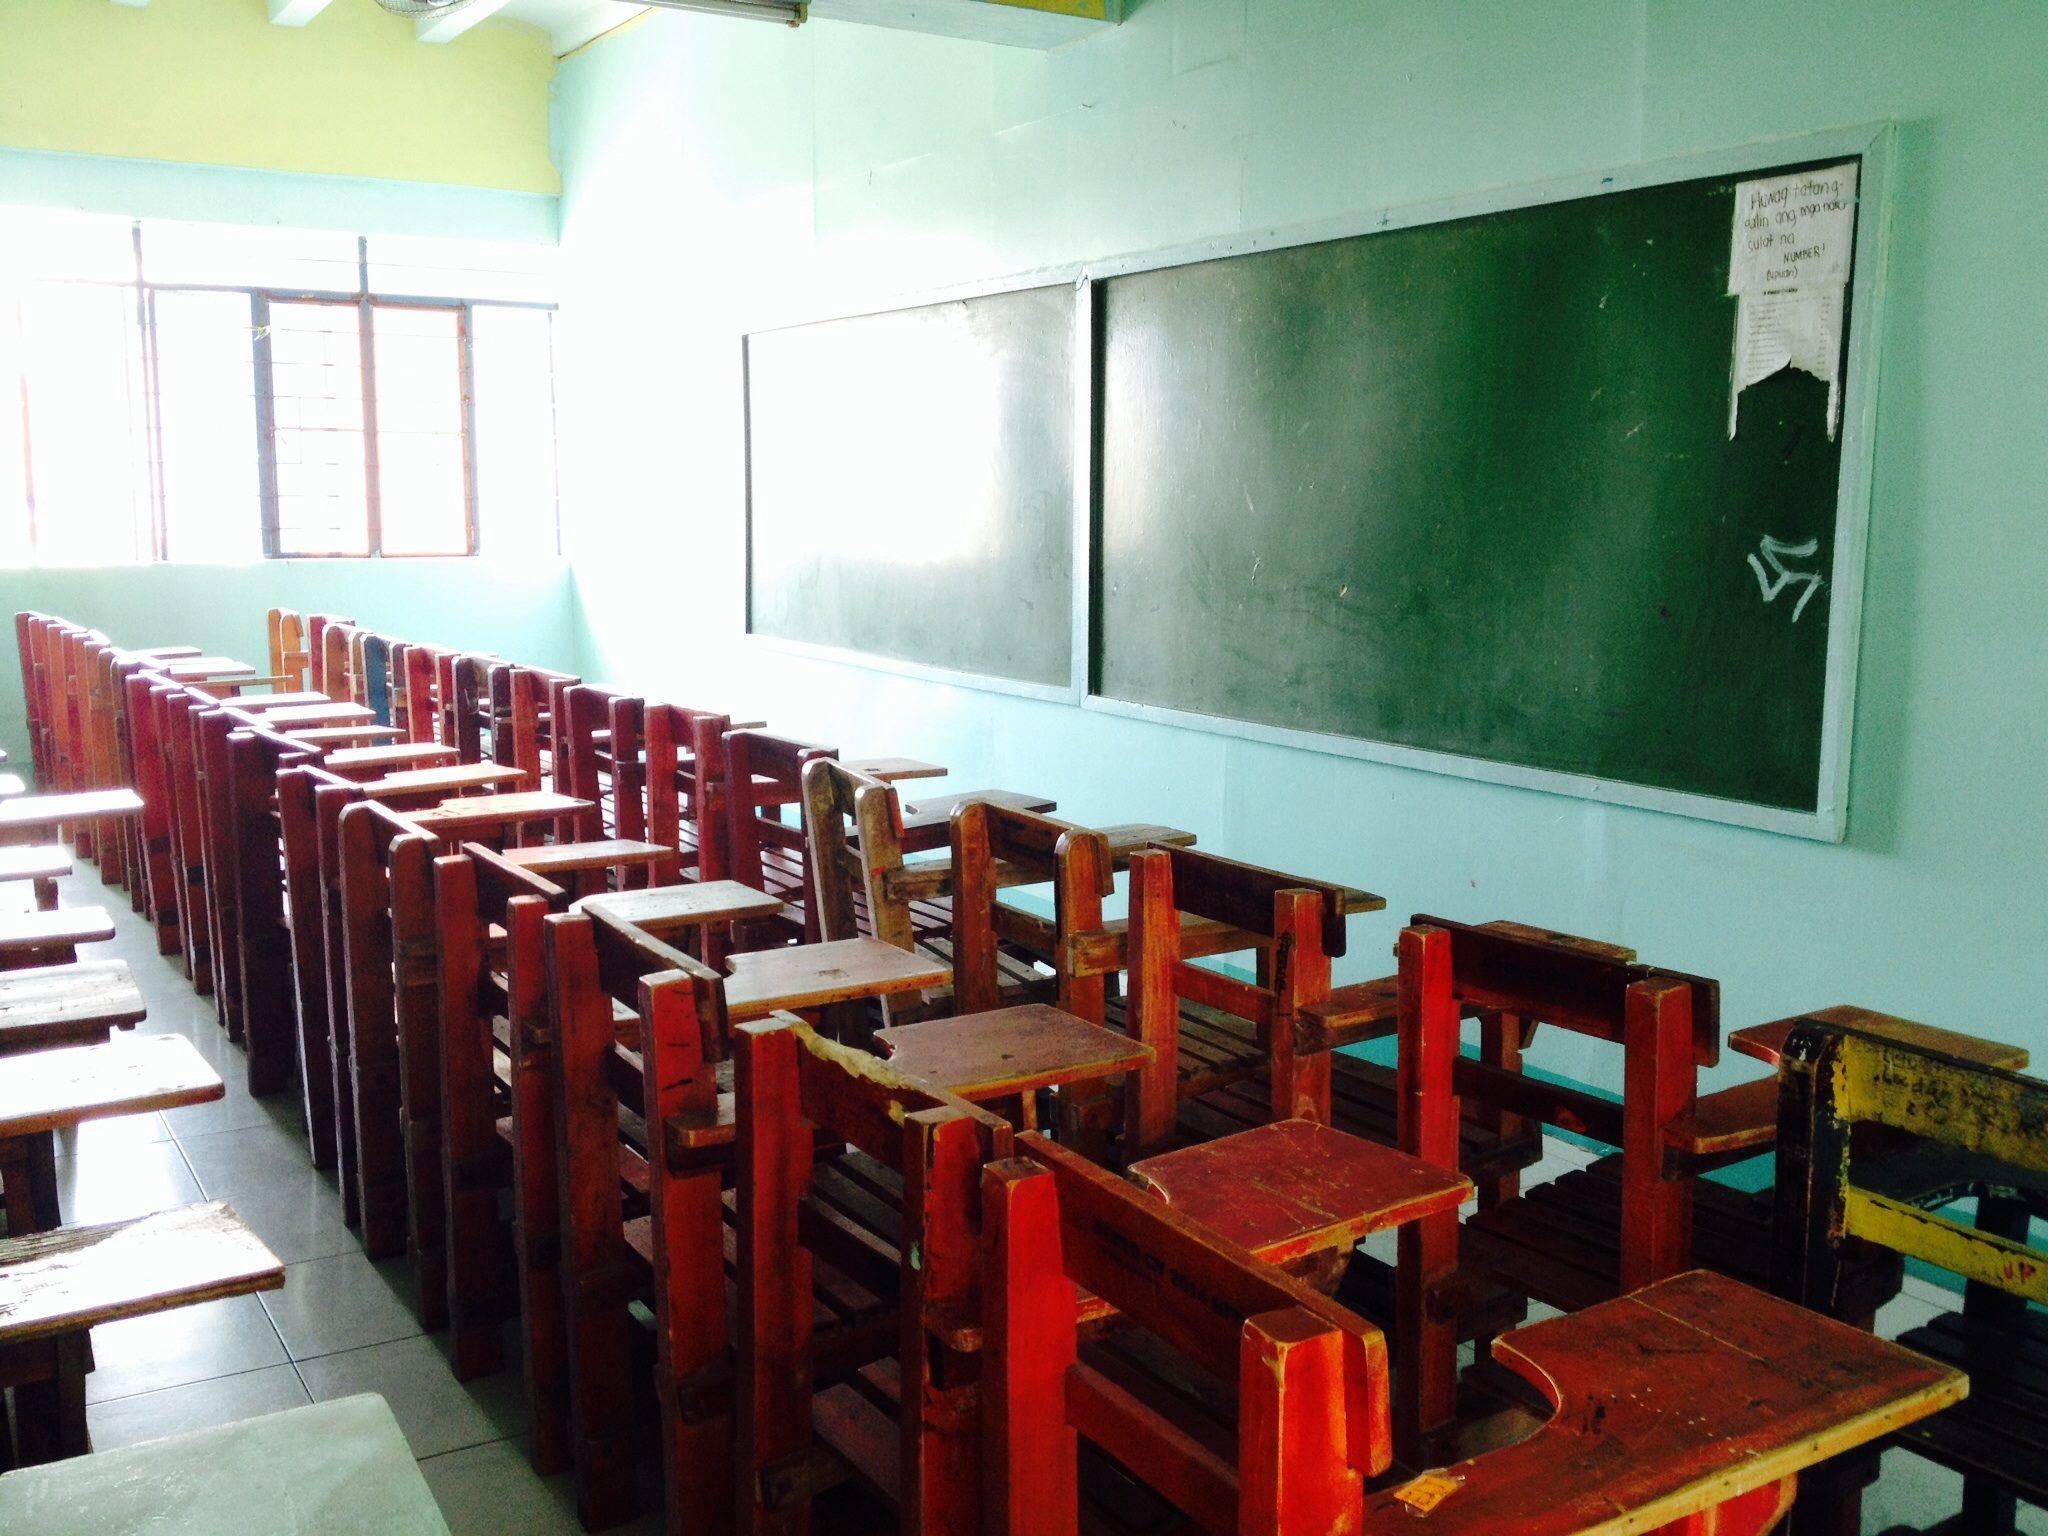 desk chair high hanging living room public schools: a teacher's checklist of concerns – subselfie.com